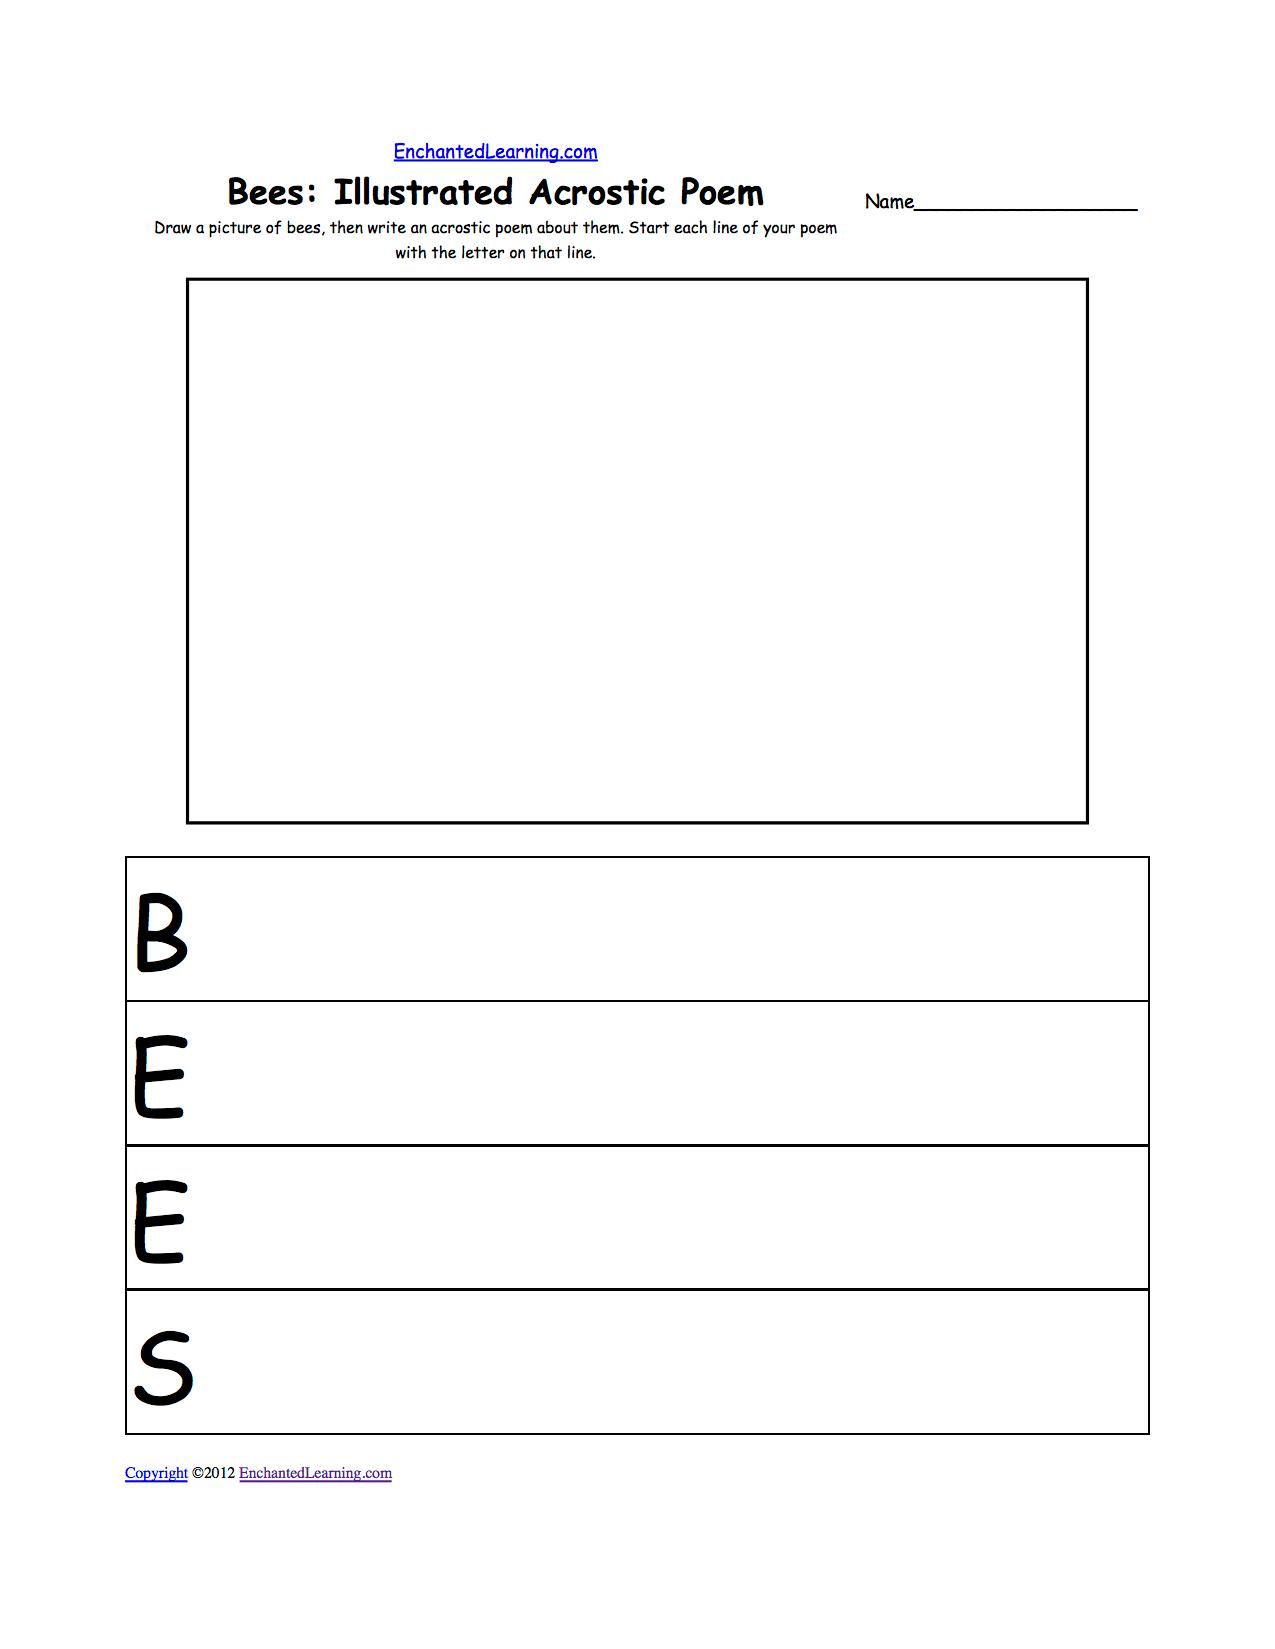 hight resolution of Illustrated Acrostic Poem Worksheets: Worksheet Printout -  EnchantedLearning.com